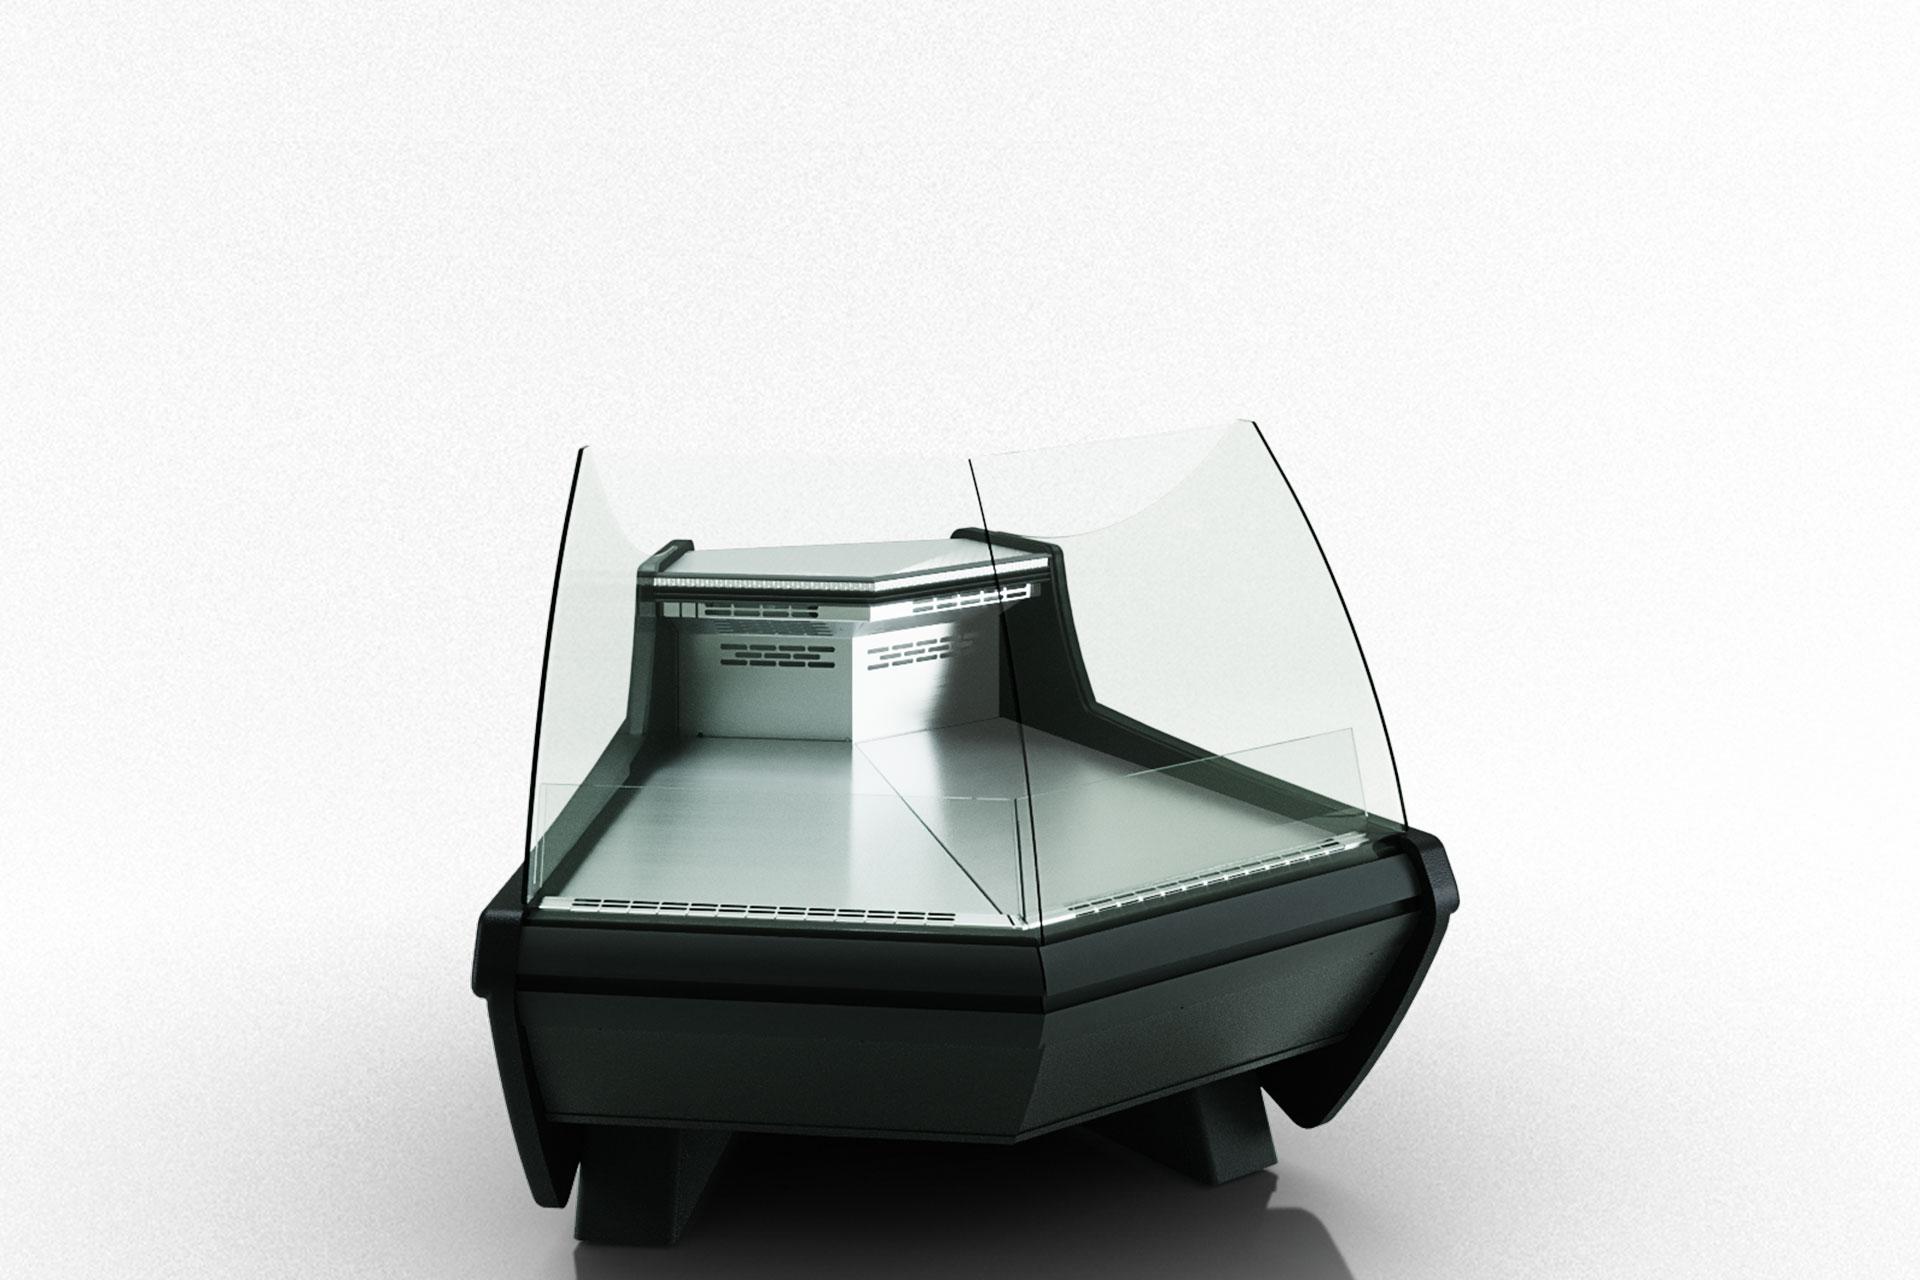 Вітрина Symphony luxe MG 100 deli T2 110-DLM-ES45